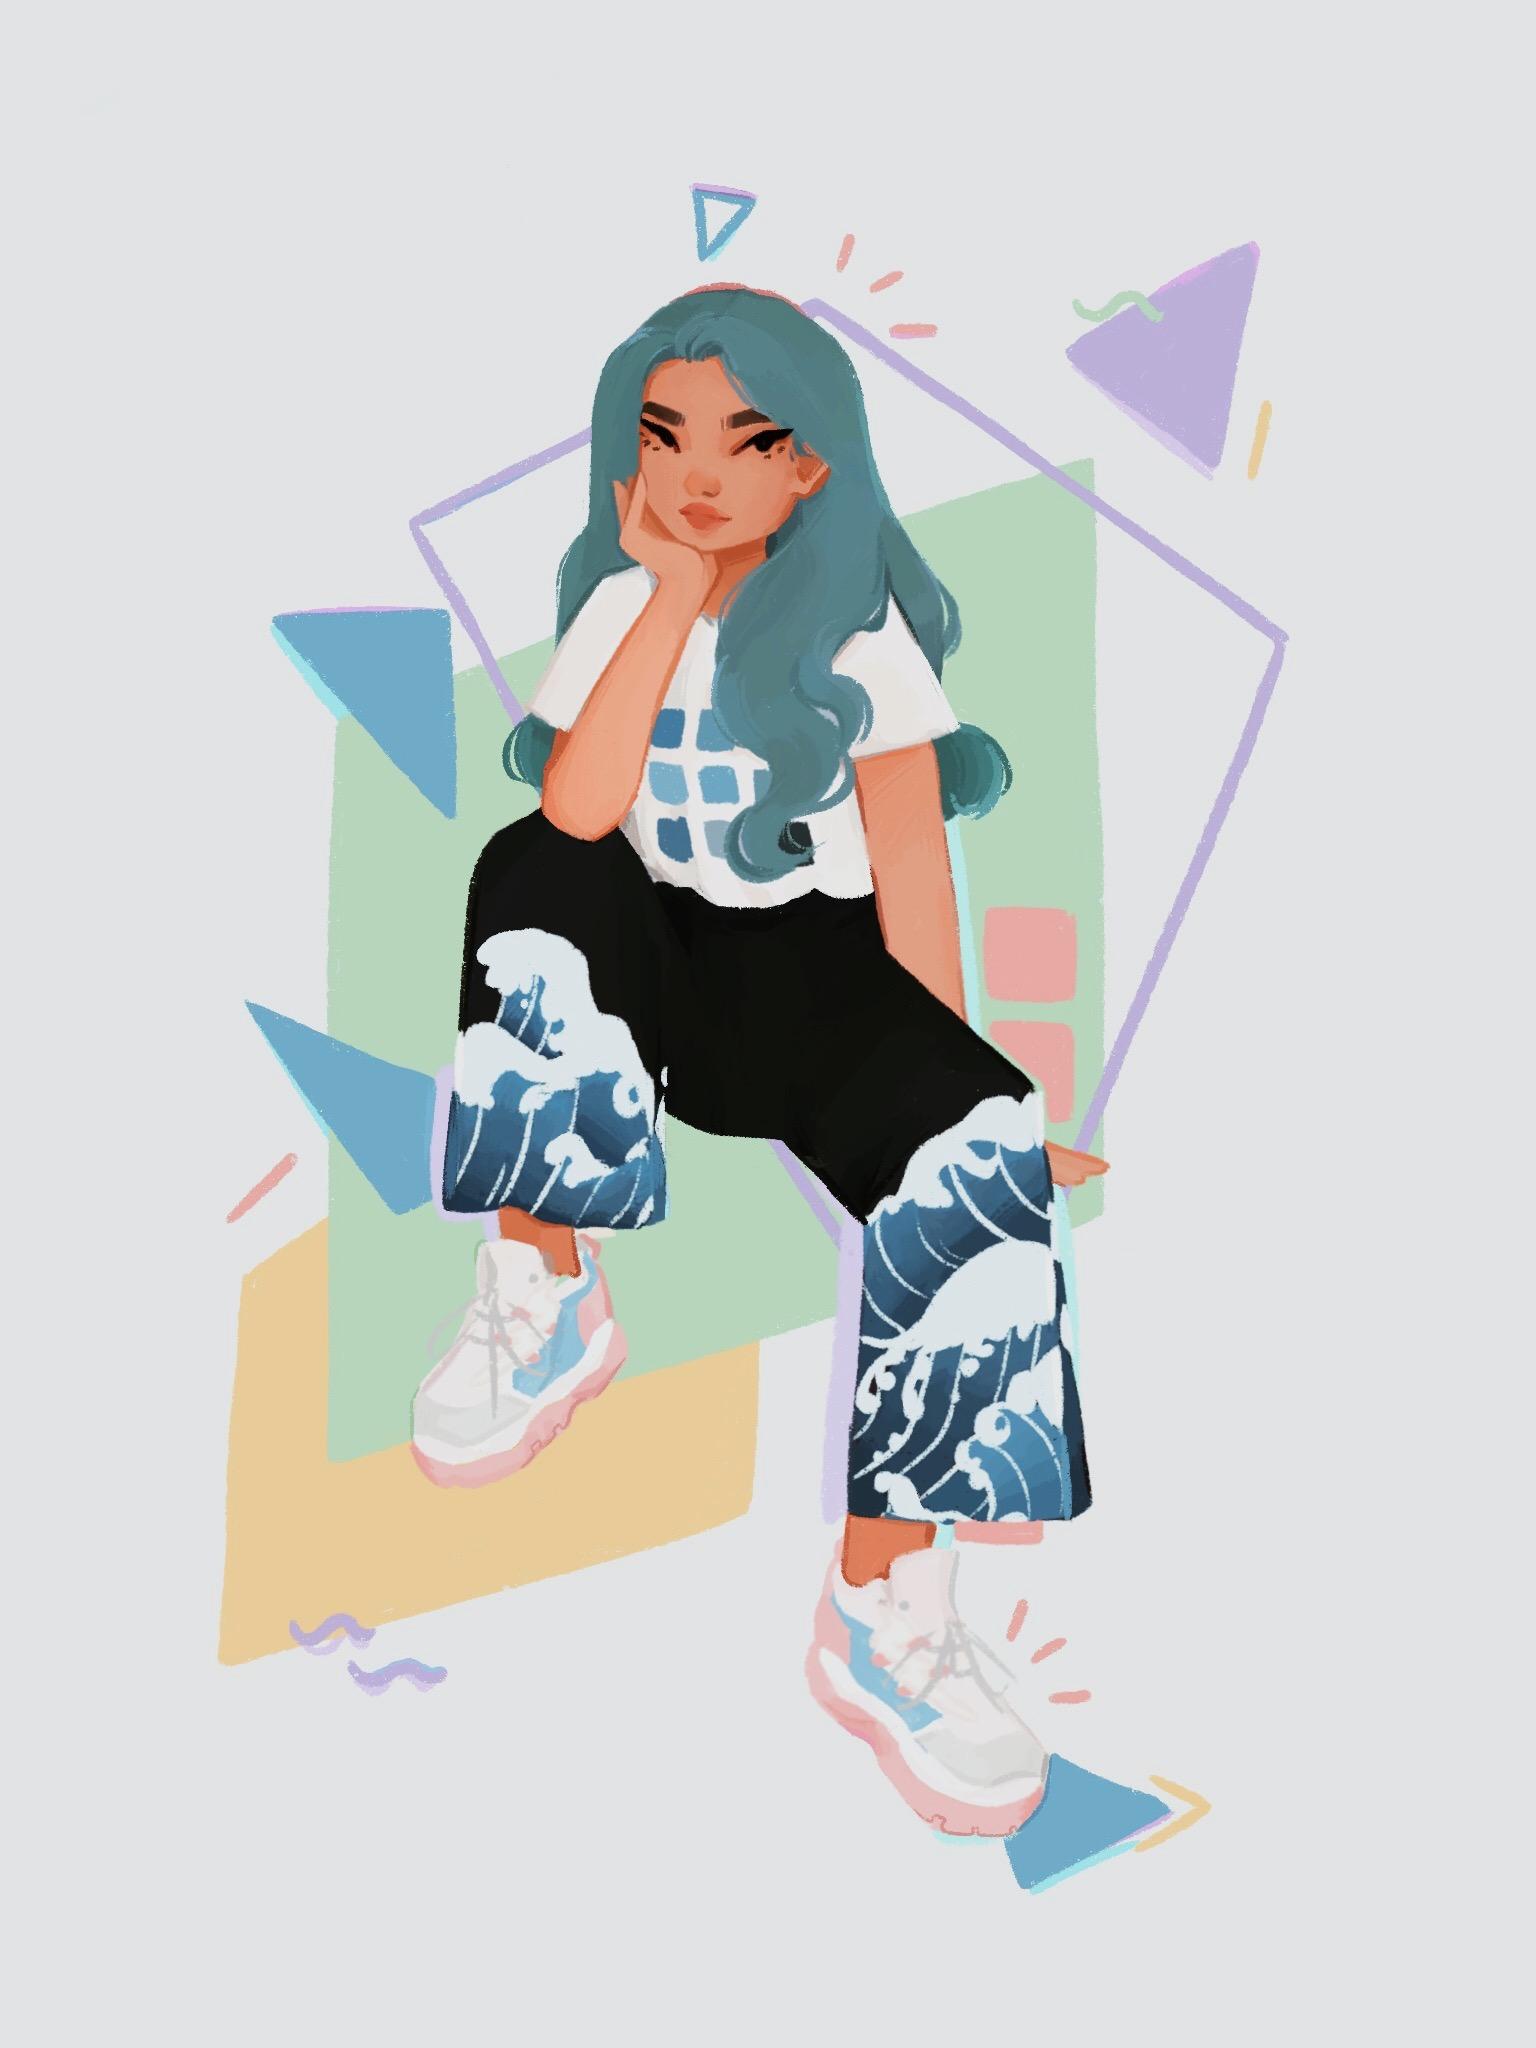 """Nineties babe"" girl illustration by Erin Jaye"